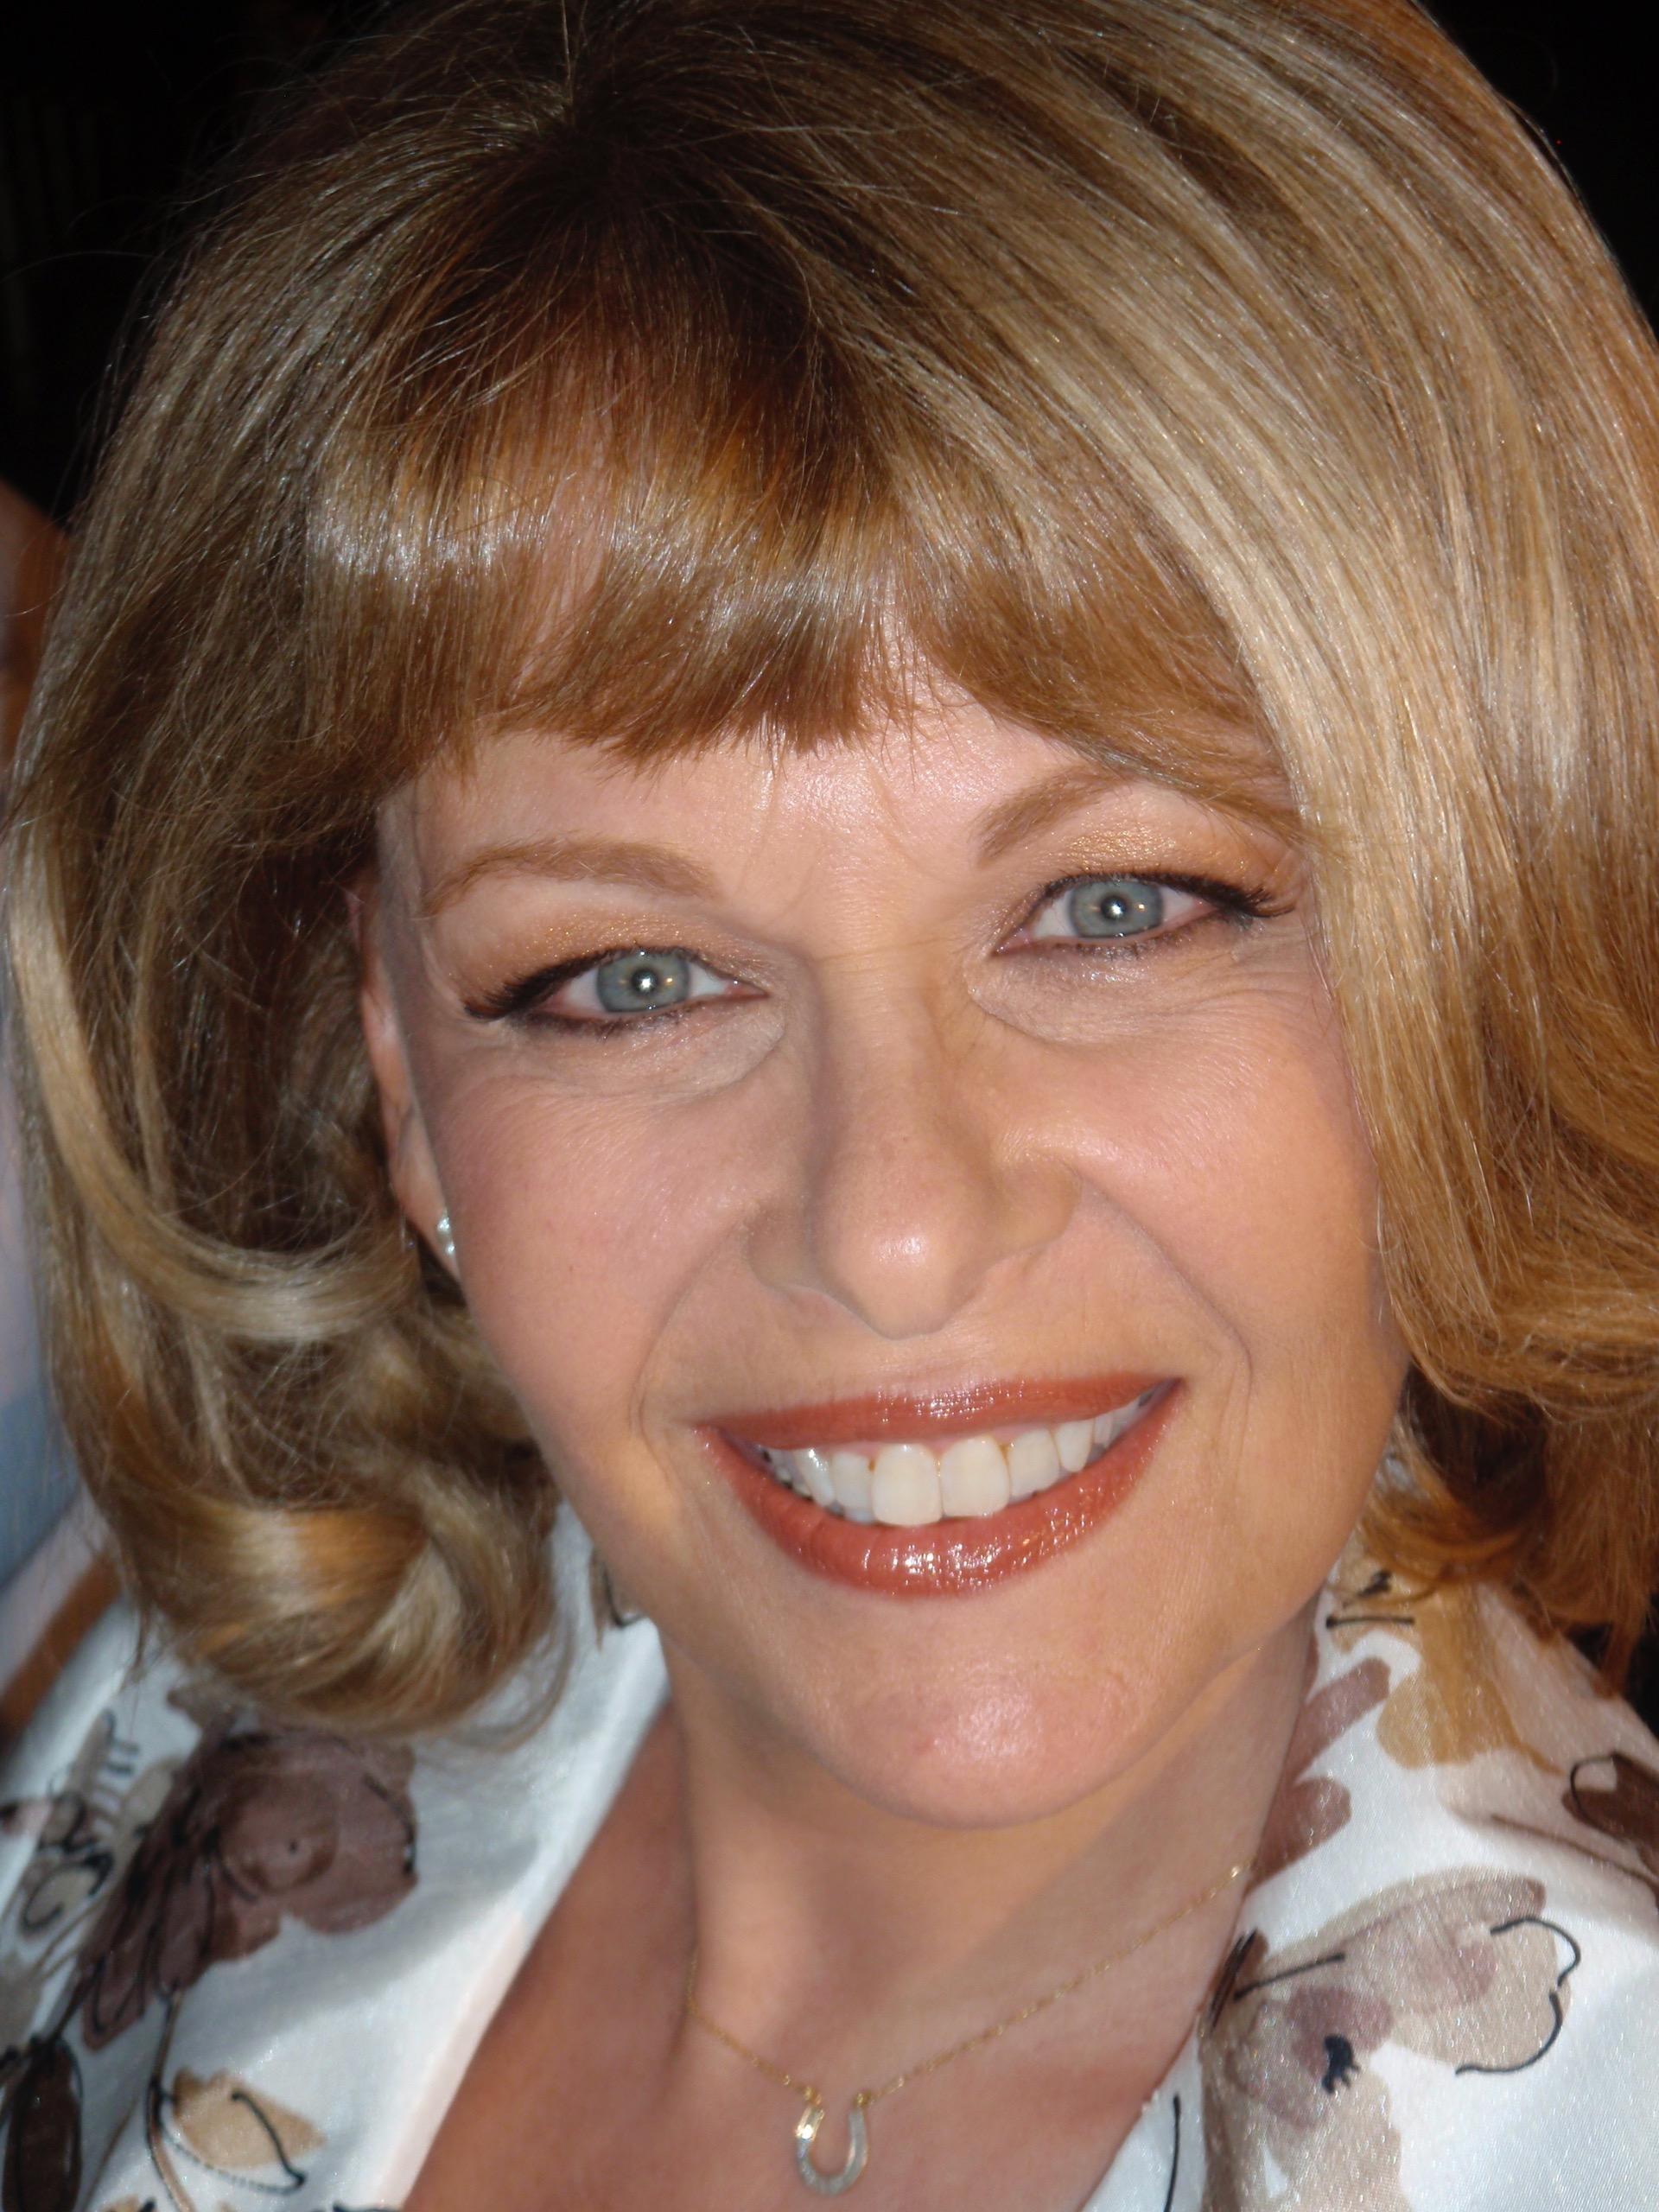 Ilene Graff - Hart of Dixie